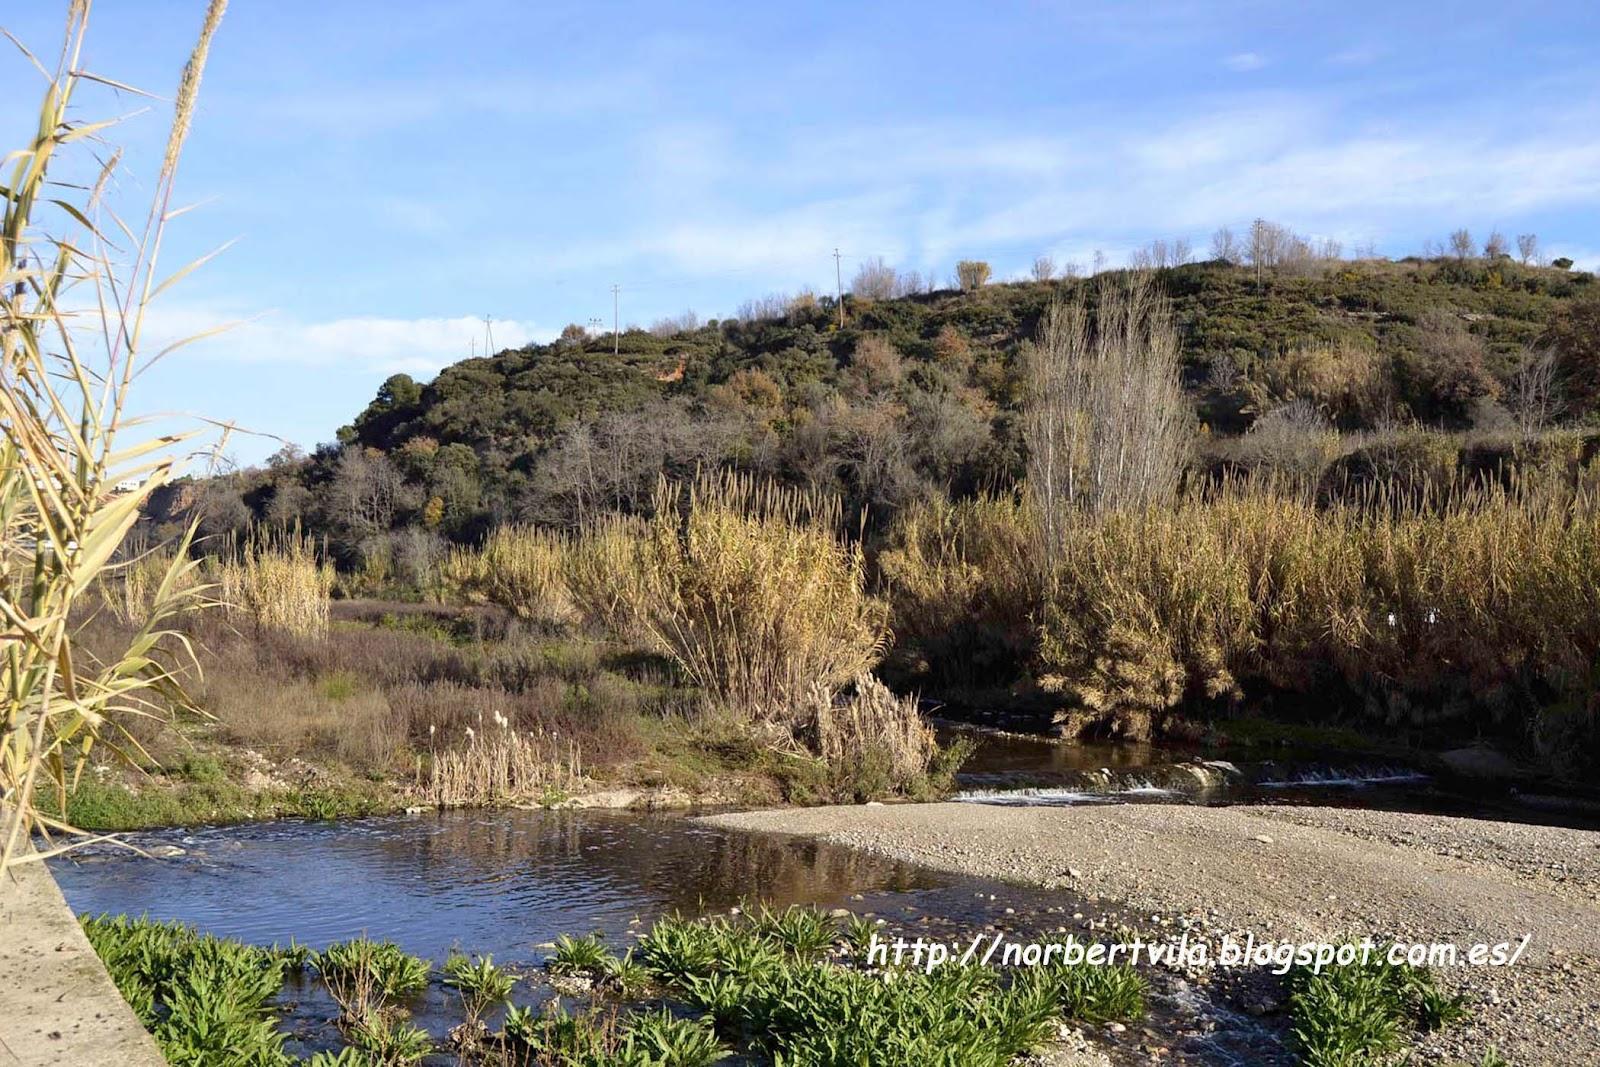 Espais de sabadell riu ripoll for Piscina municipal ripoll